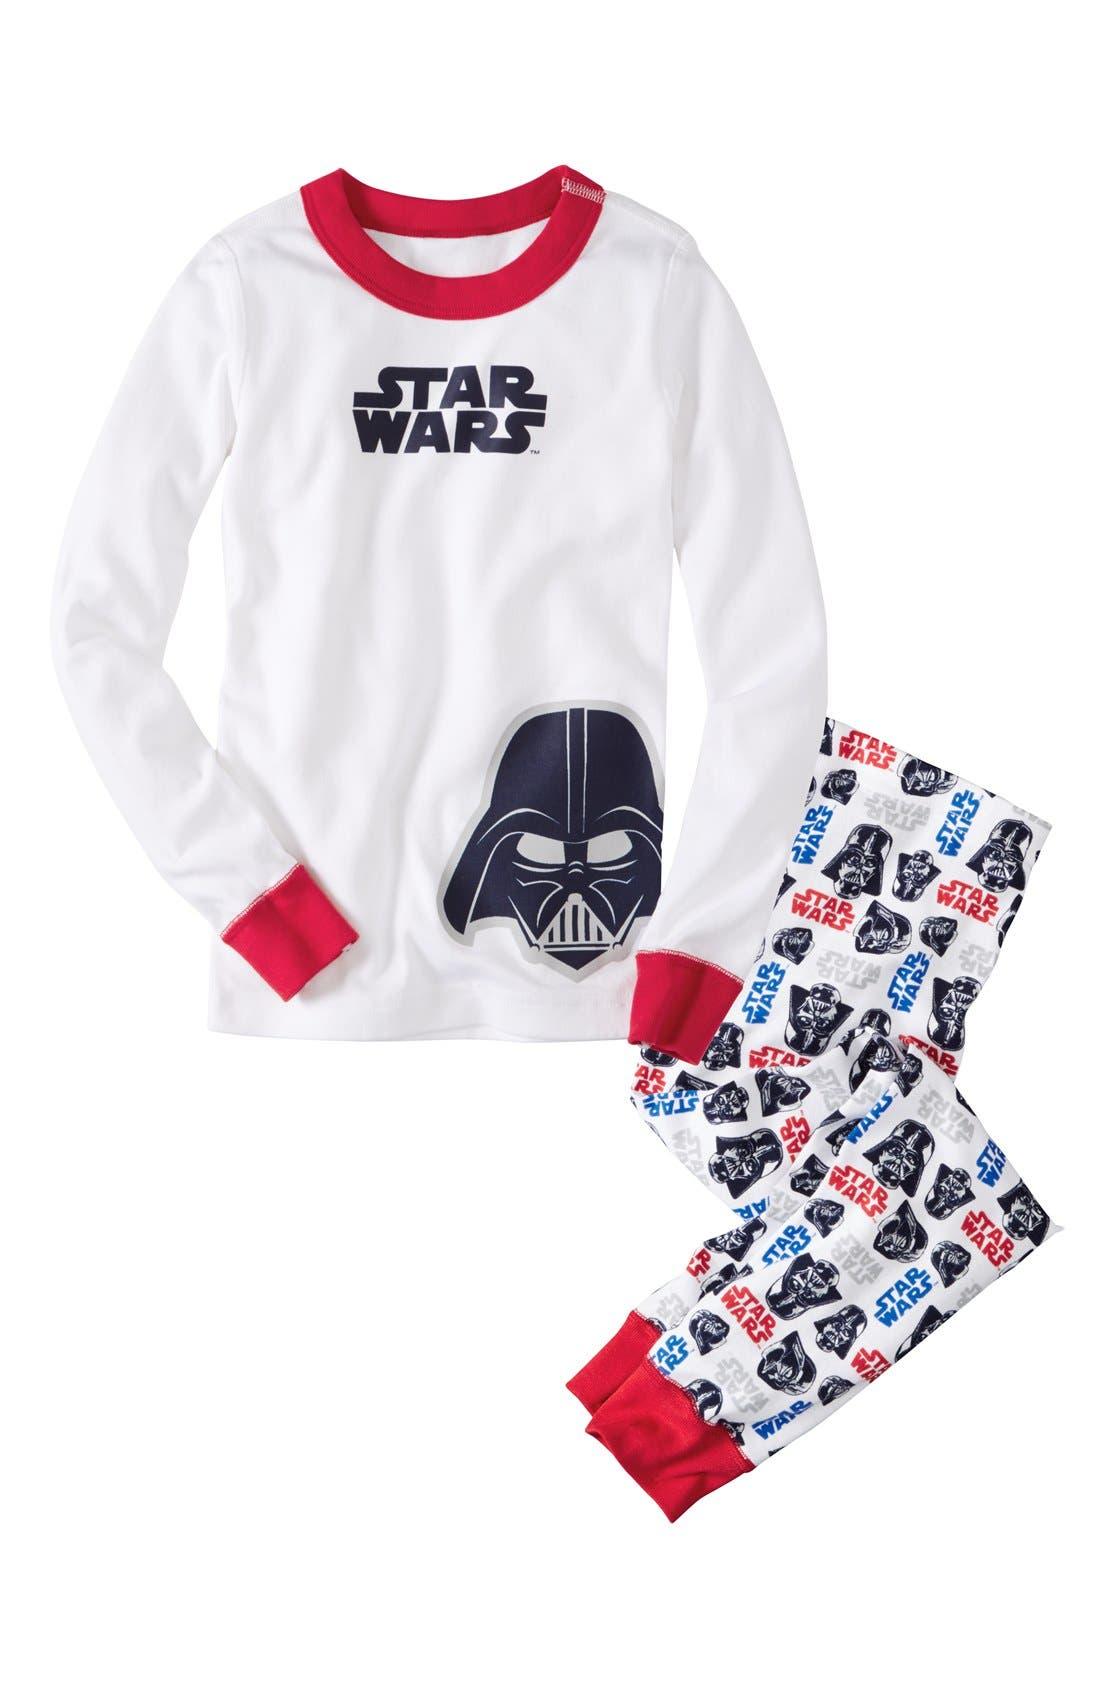 Main Image - Hanna Andersson 'Star Wars™ - Darth Vader' Two-Piece Pajamas (Toddler Boys, Little Boys & Big Boys)